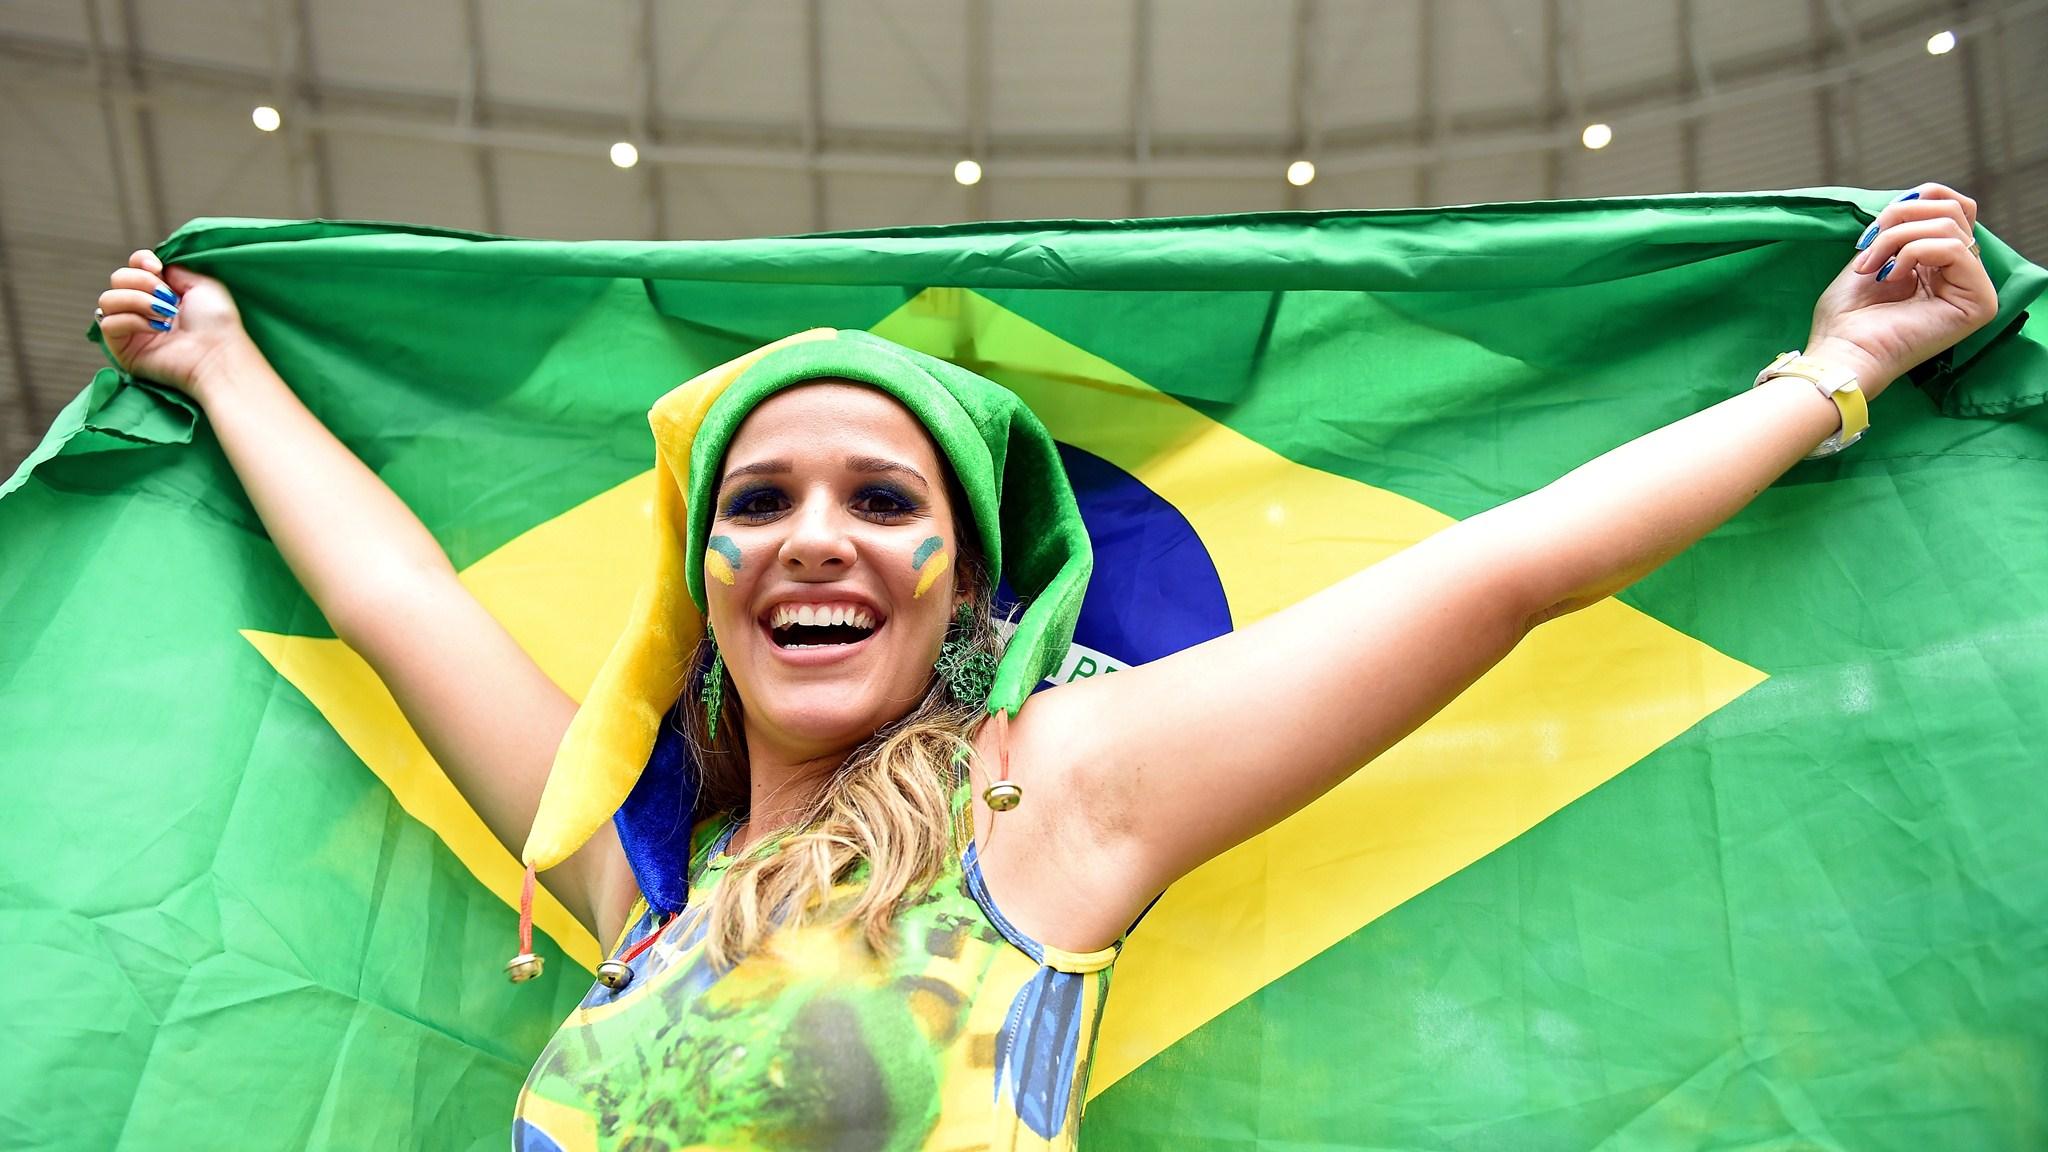 140 - Brazil-Mexico [0-0] -- 17 Jun 2014 - 16-00 -- Fortaleza - Estadio Castelao - kuaza